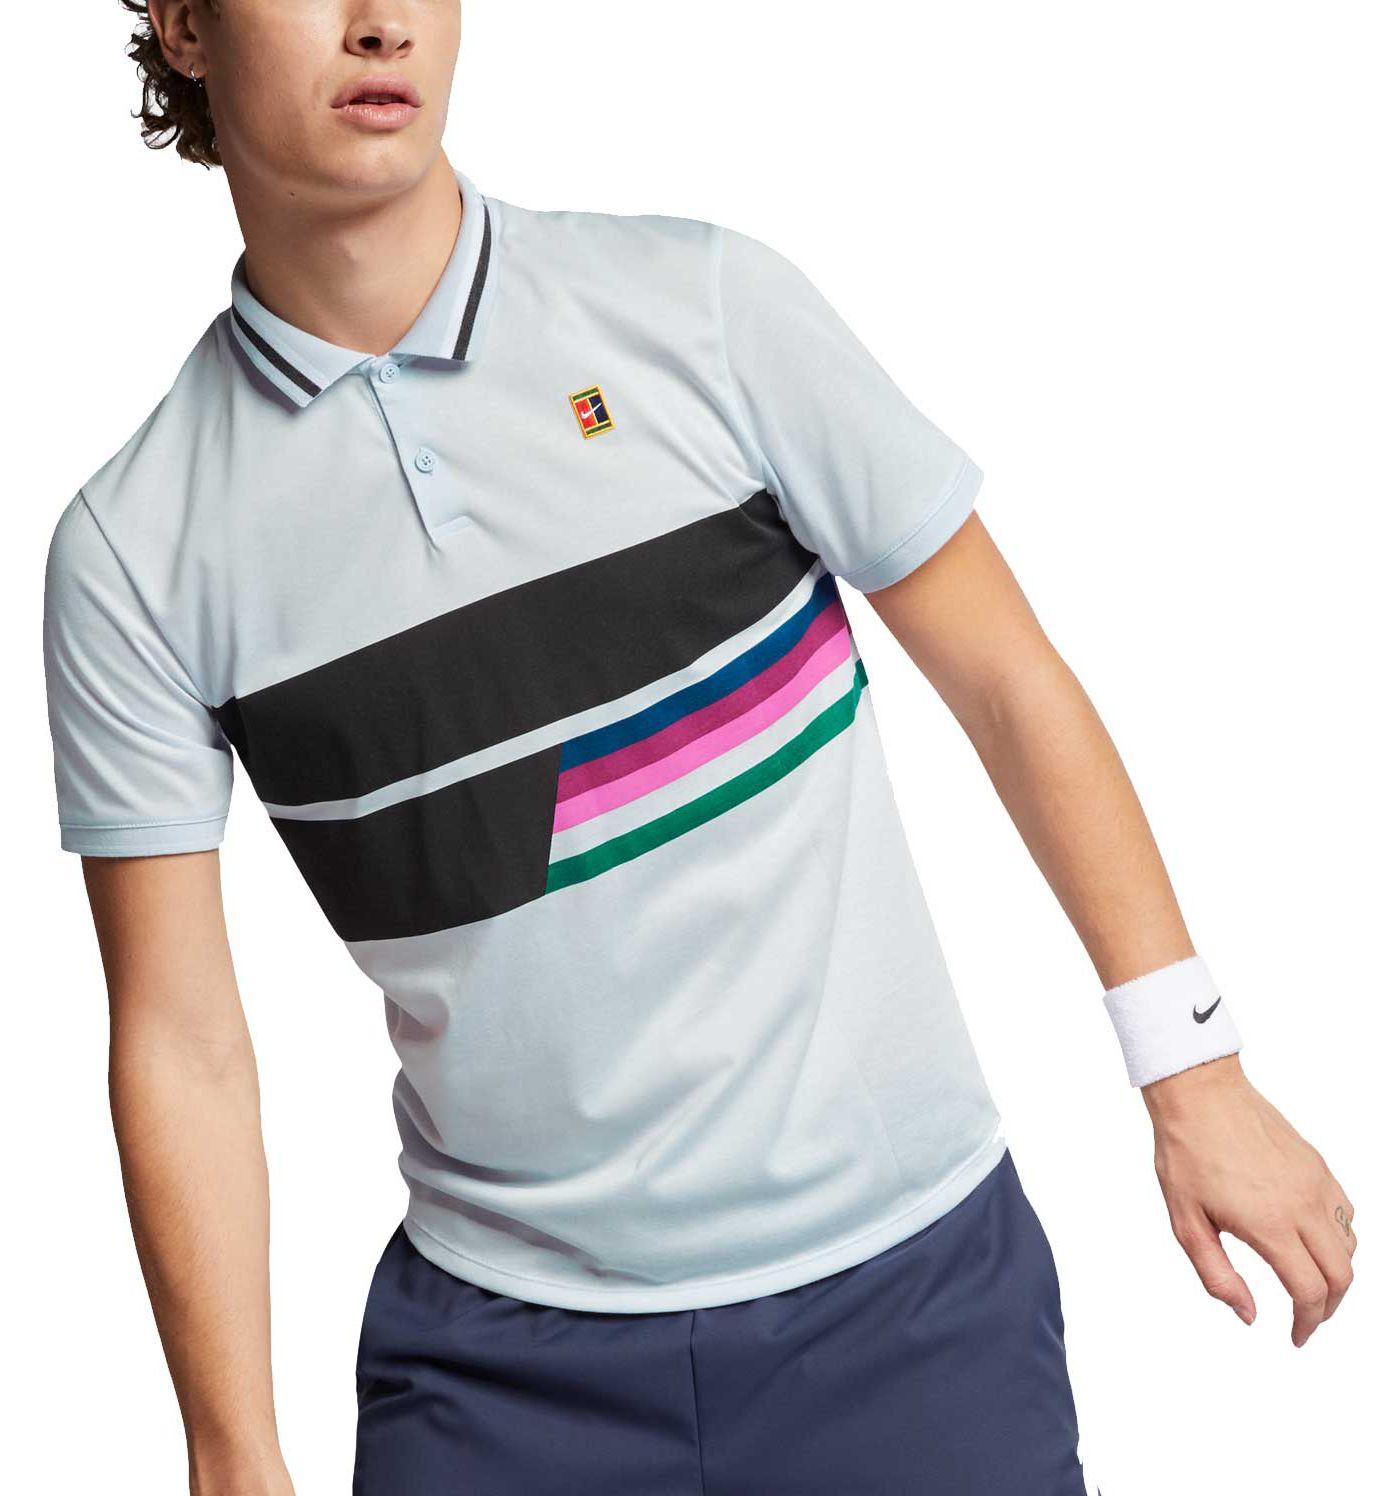 Nike Men's Roger Federer NikeCourt Advantage Dri-FIT Tennis Polo